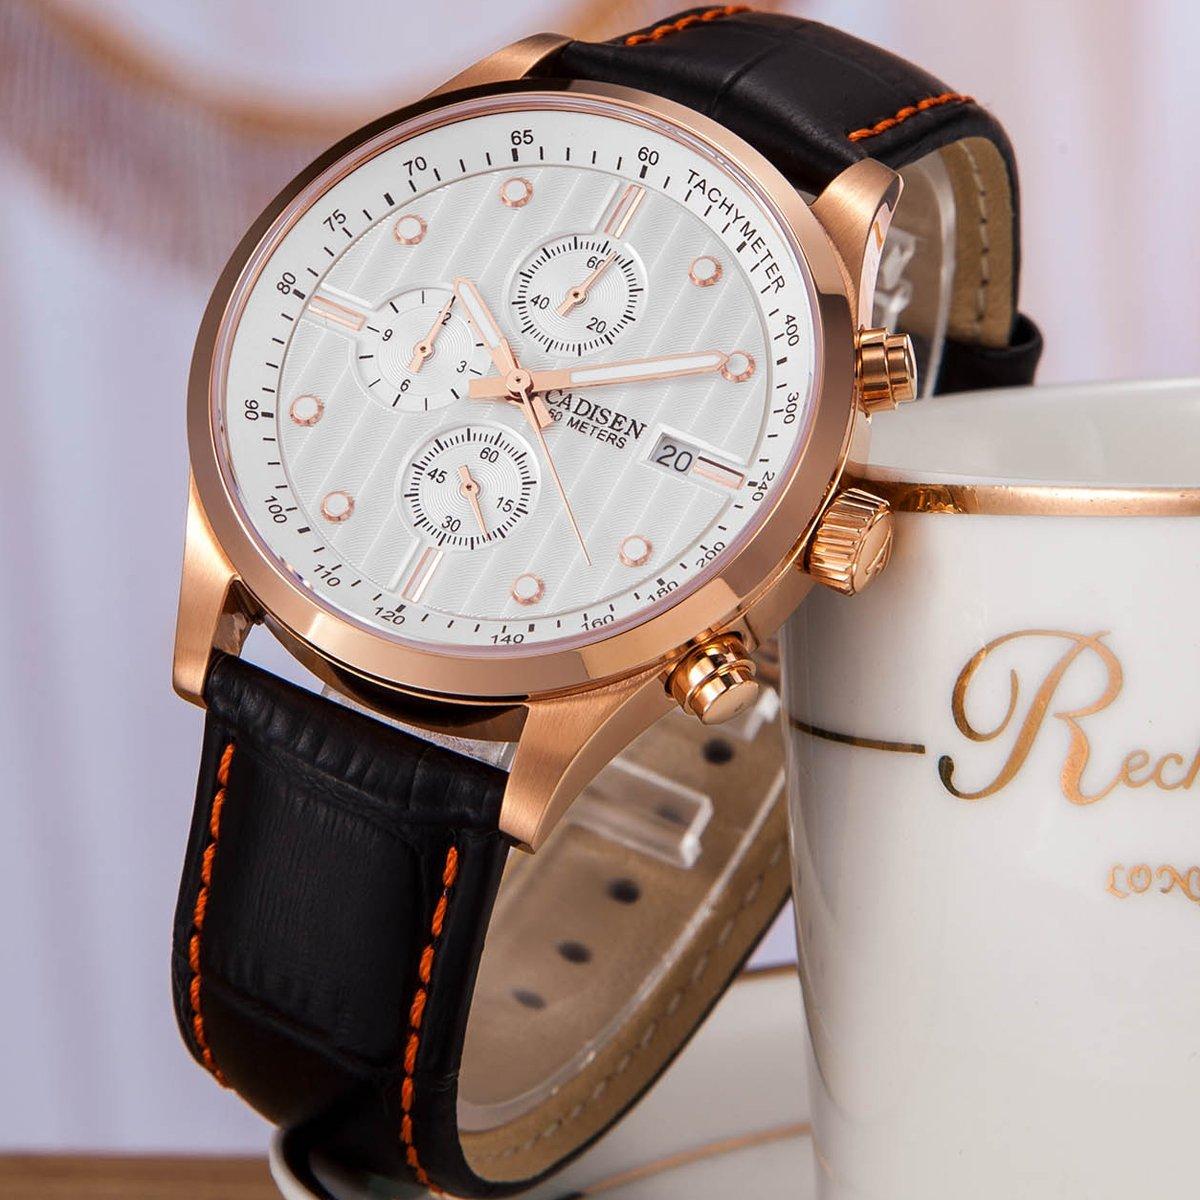 Amazon.com: CADISEN Mens Sapphire Black Casual Luxury Businesss Sports Quartz Watches: Watches